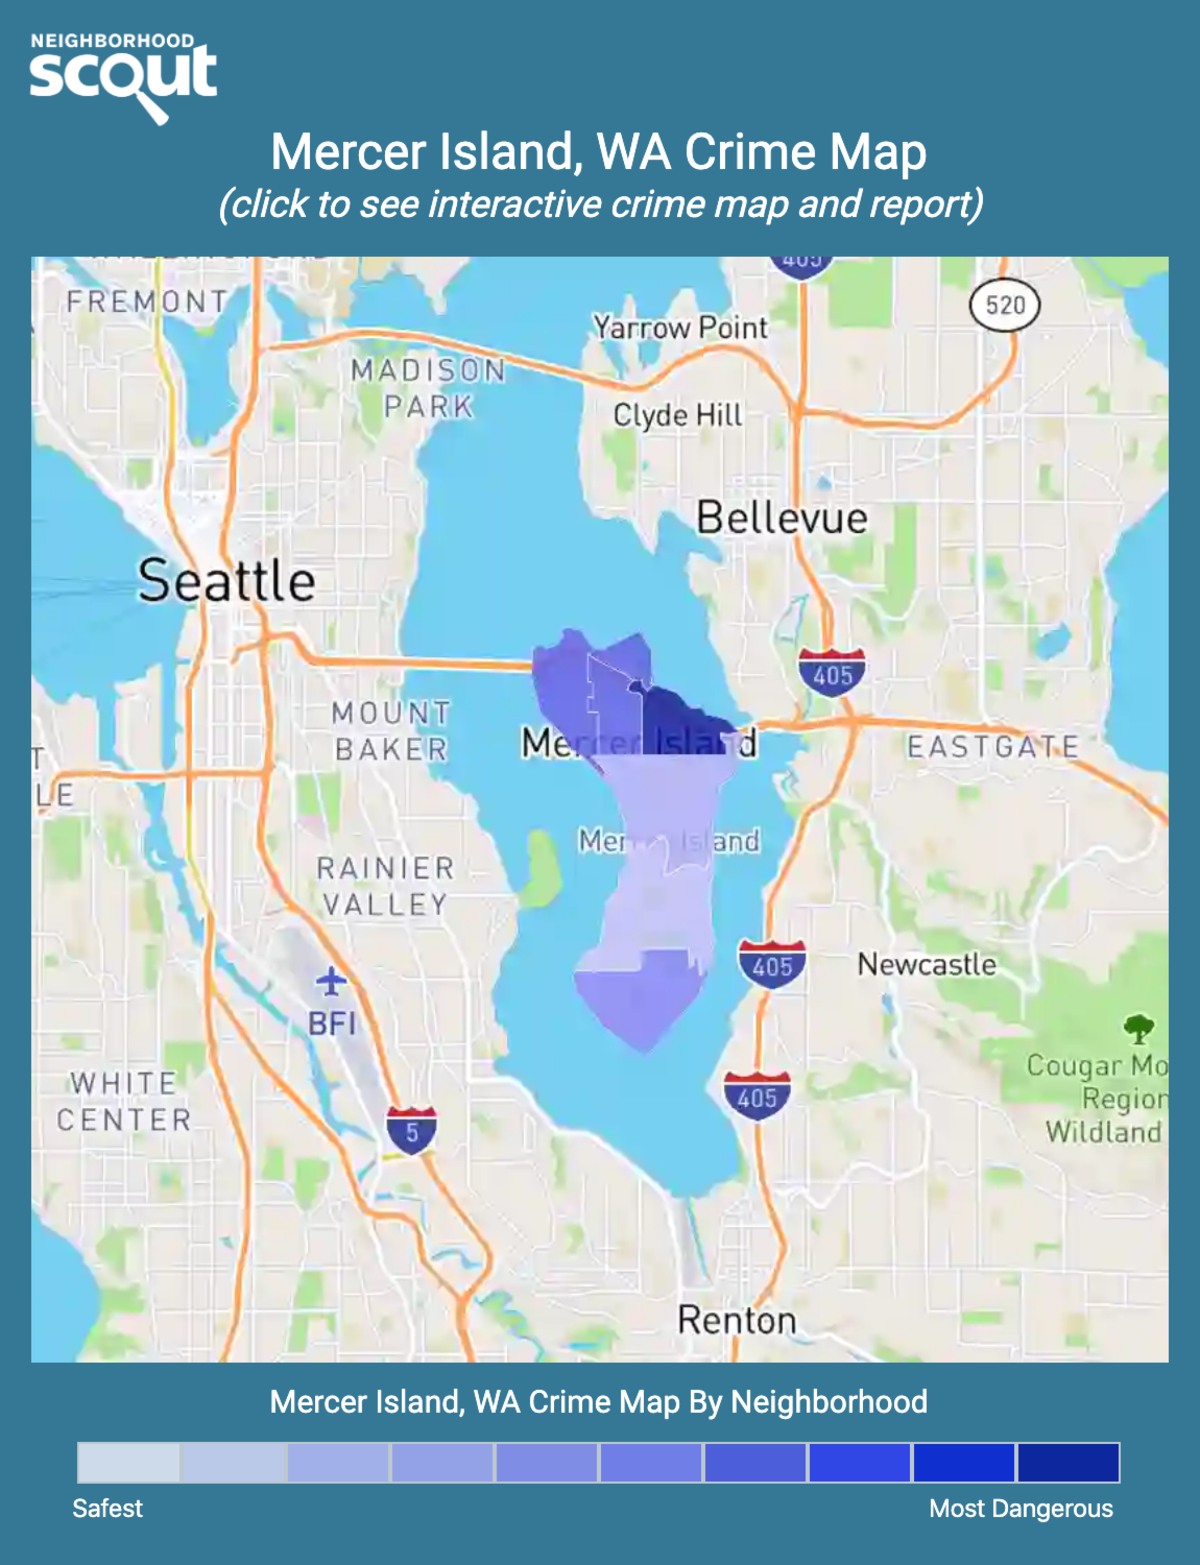 Mercer Island, Washington crime map